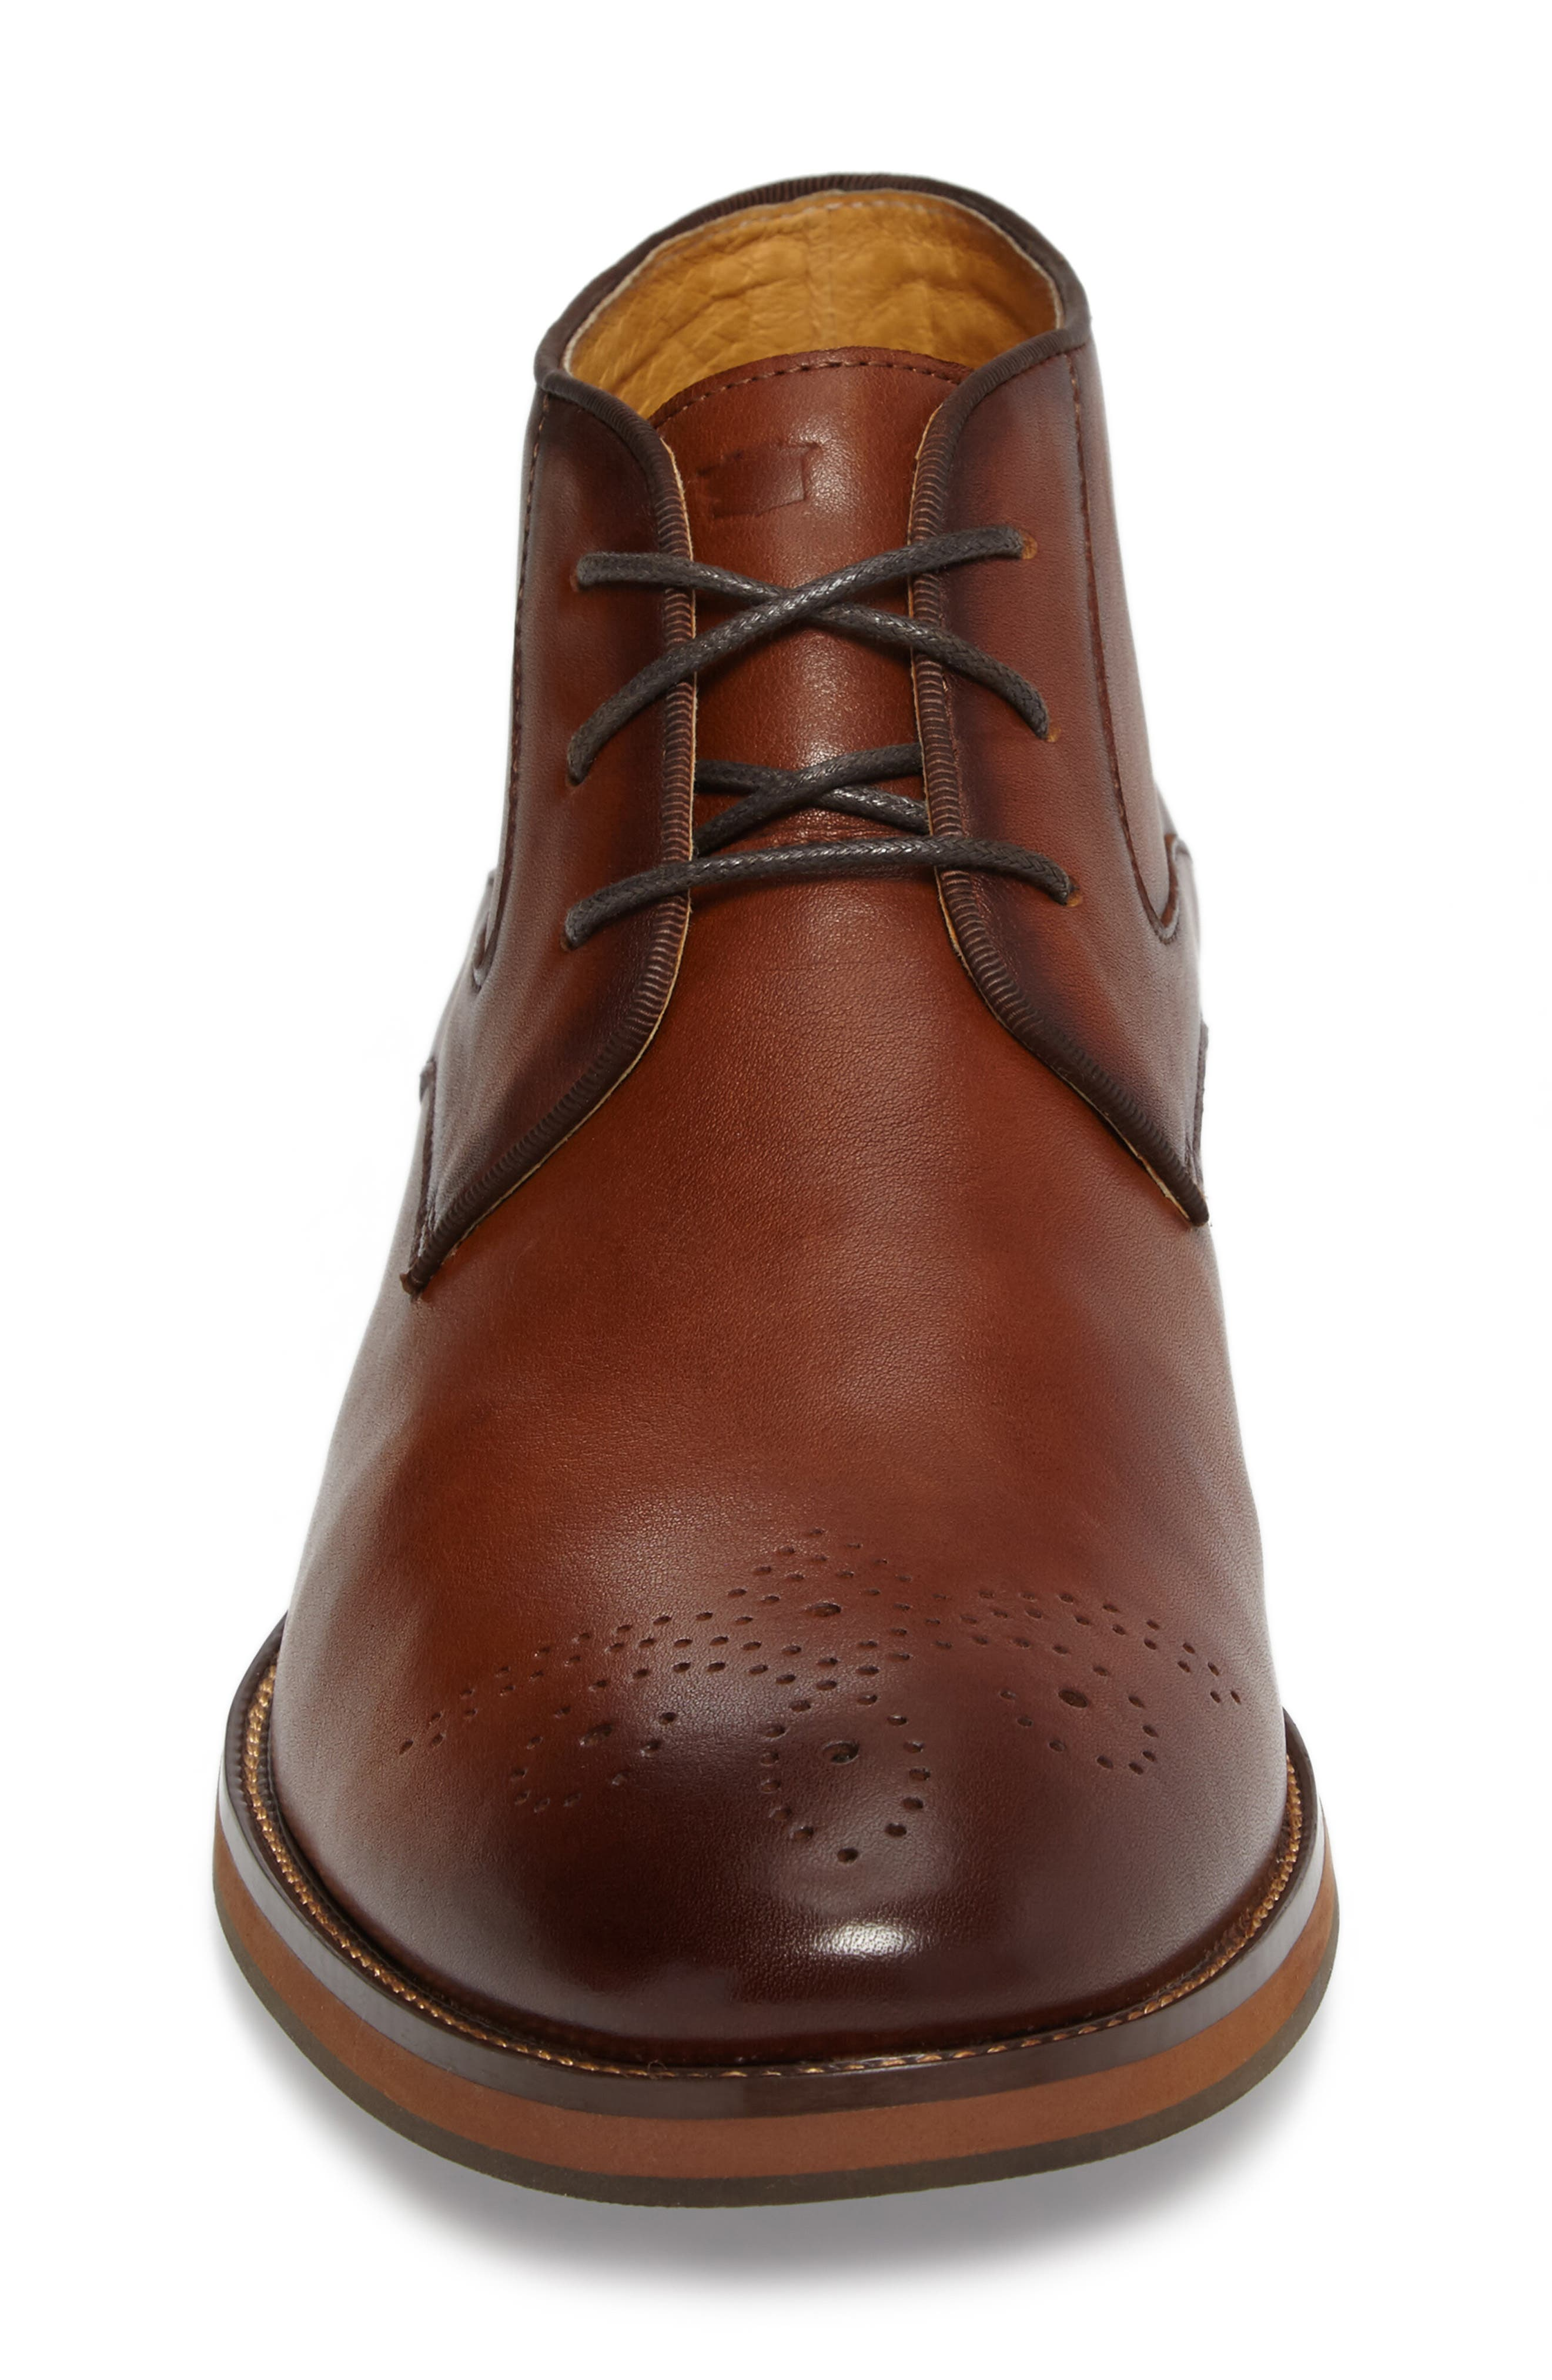 Blaze Chukka Boot,                             Alternate thumbnail 4, color,                             Cognac Leather